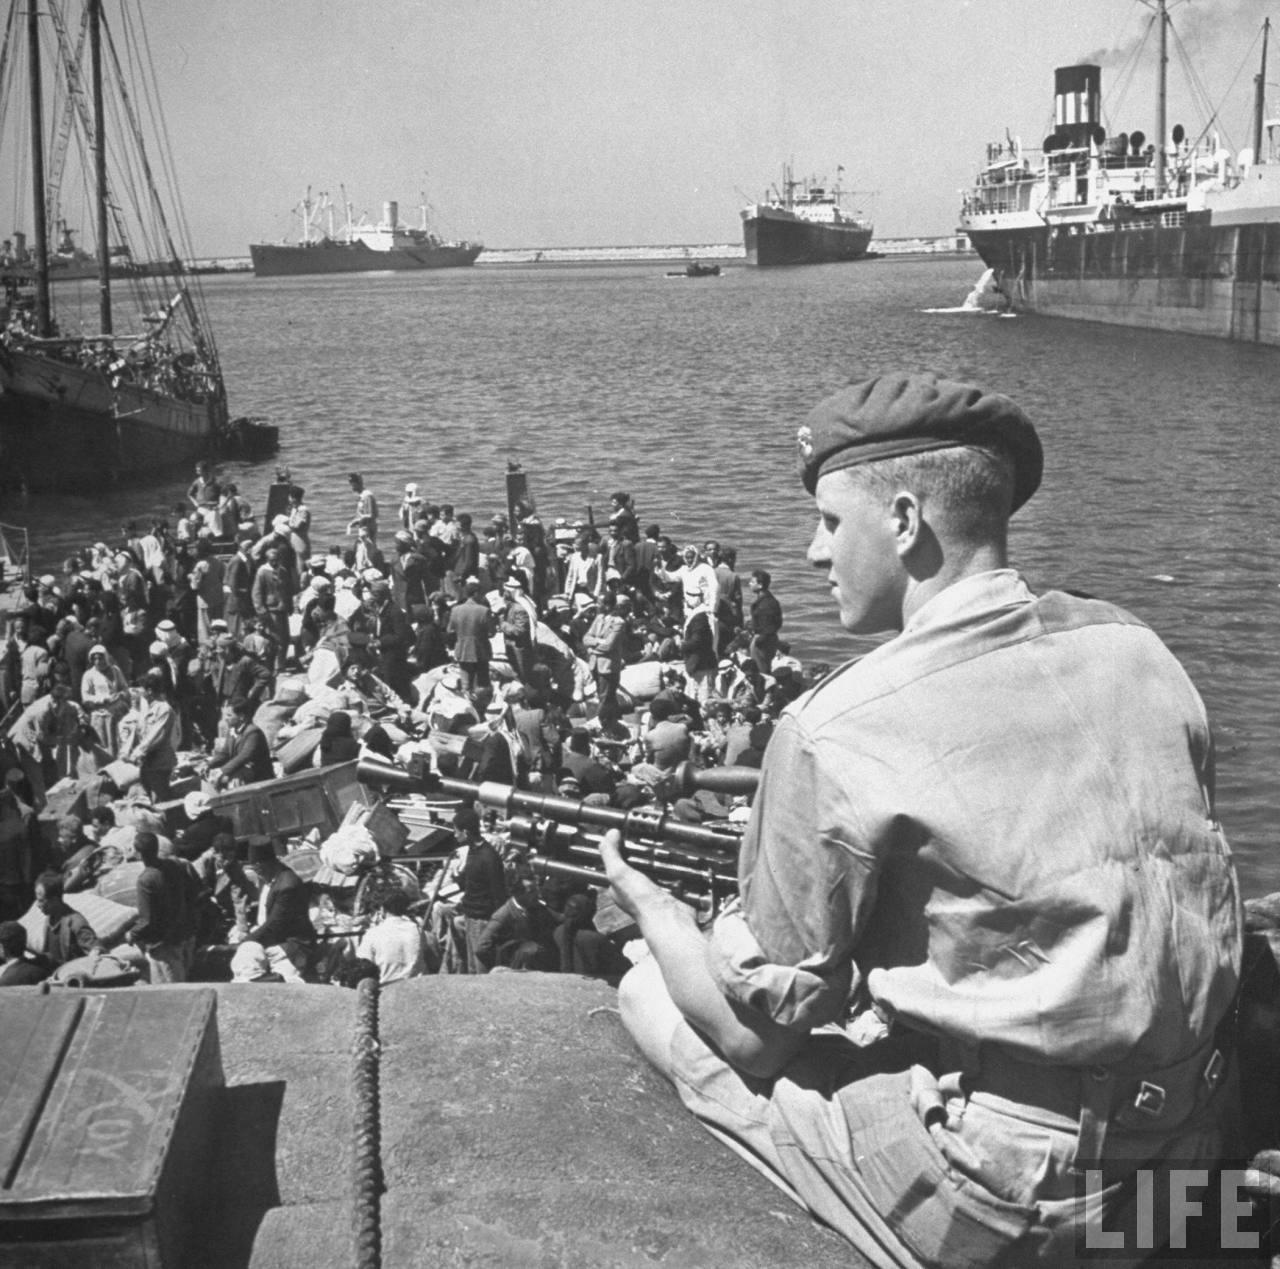 British soldier sitting guard on a rooftop Haifa_Dmitri Kessel_LIFE 1948